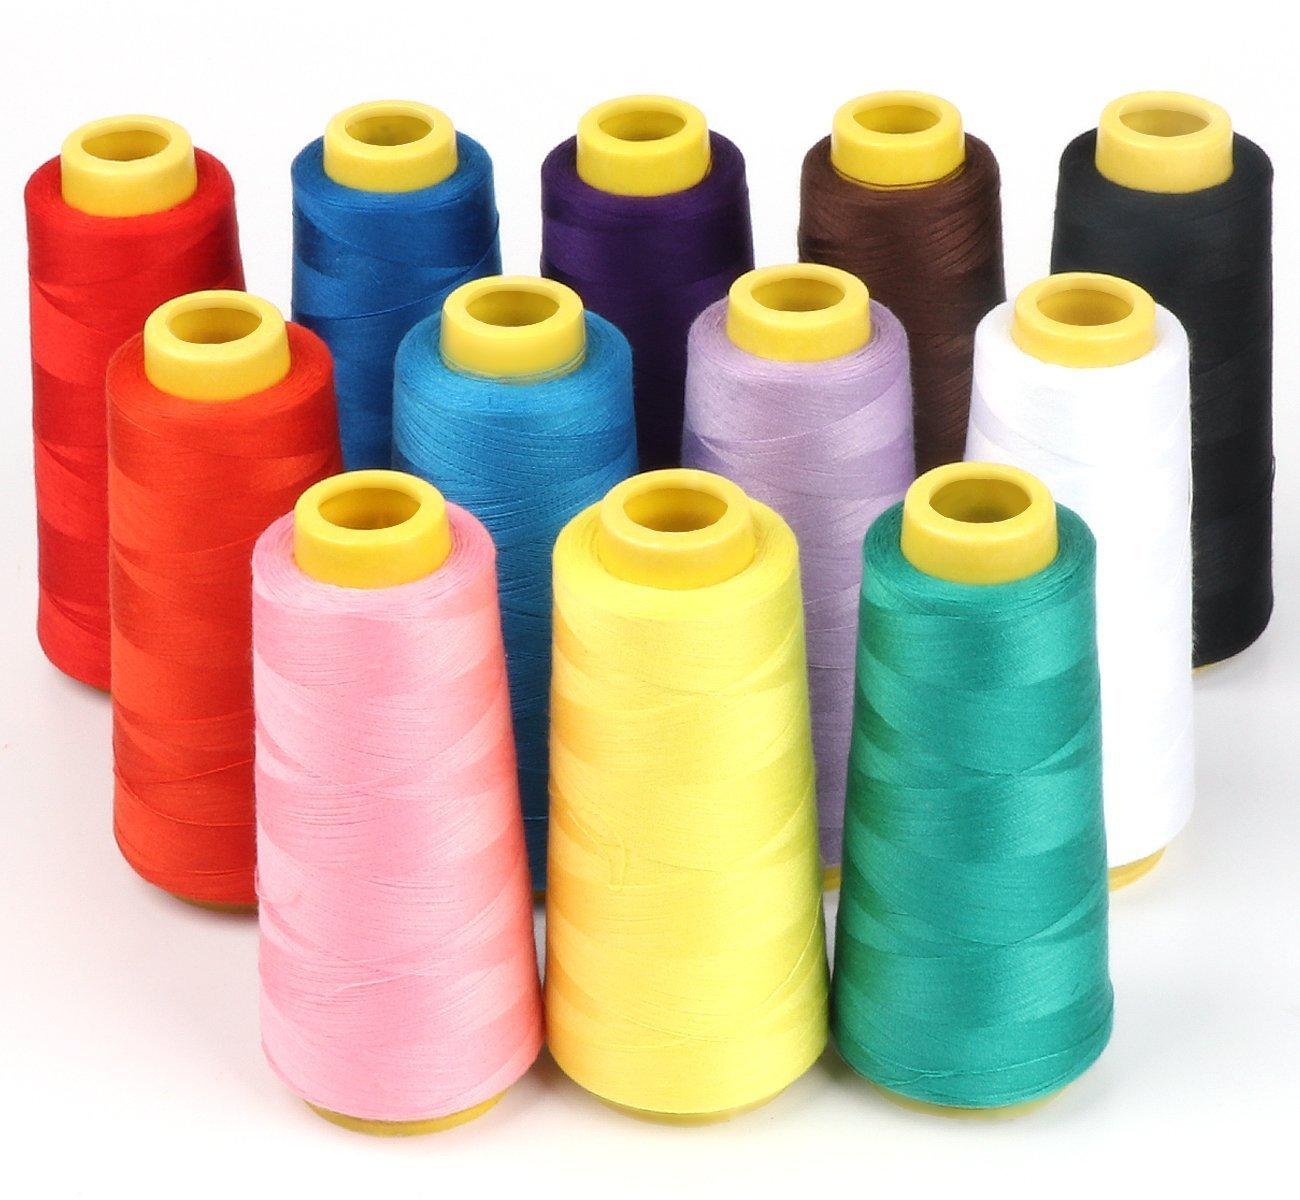 ilauke Overlock Assorted Polyester Quilting